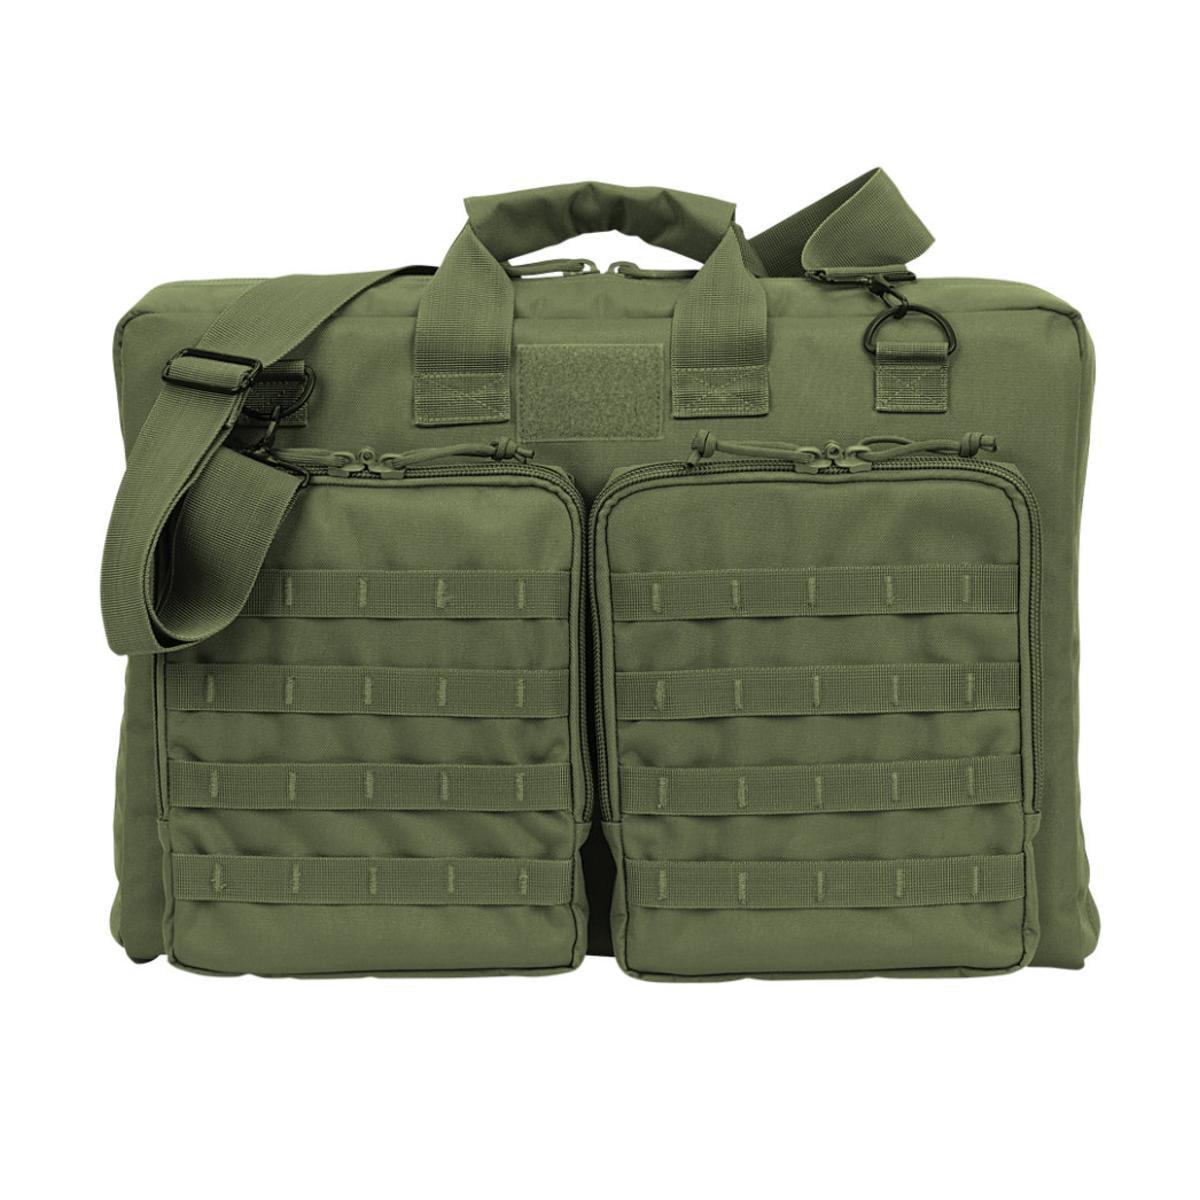 Voodoo Tactical 20-9420 Deluxe Terminator Padded MOLLE Range Bag